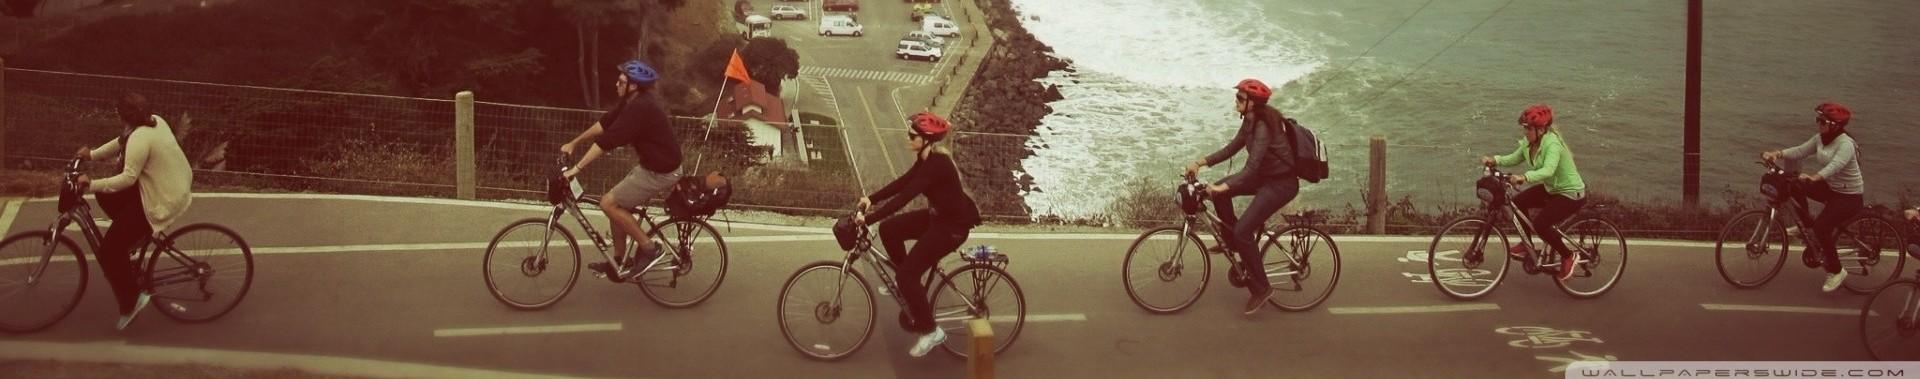 biking-in-san-francisco_00436364